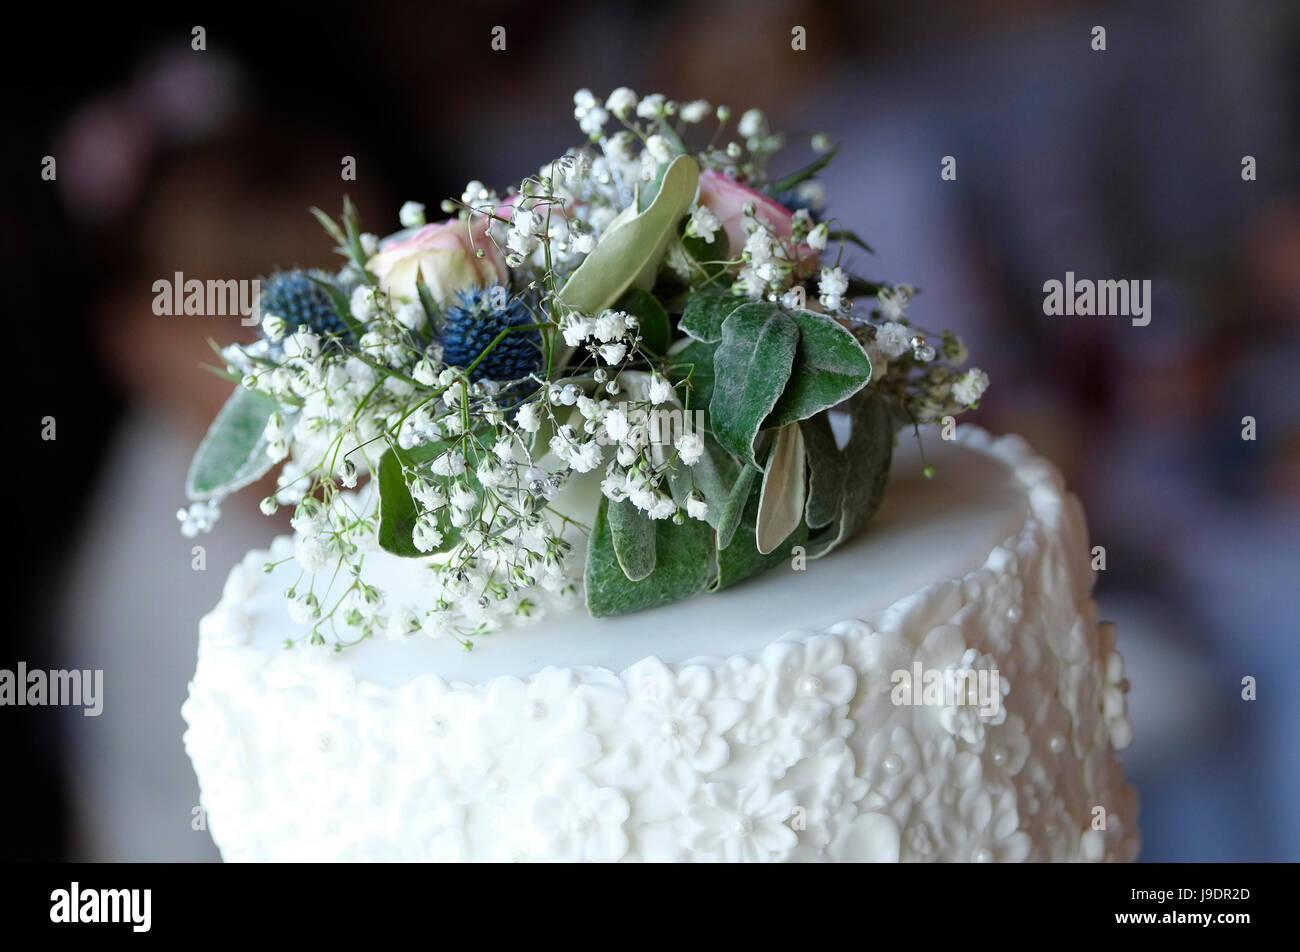 flower display on top of wedding cake - Stock Image